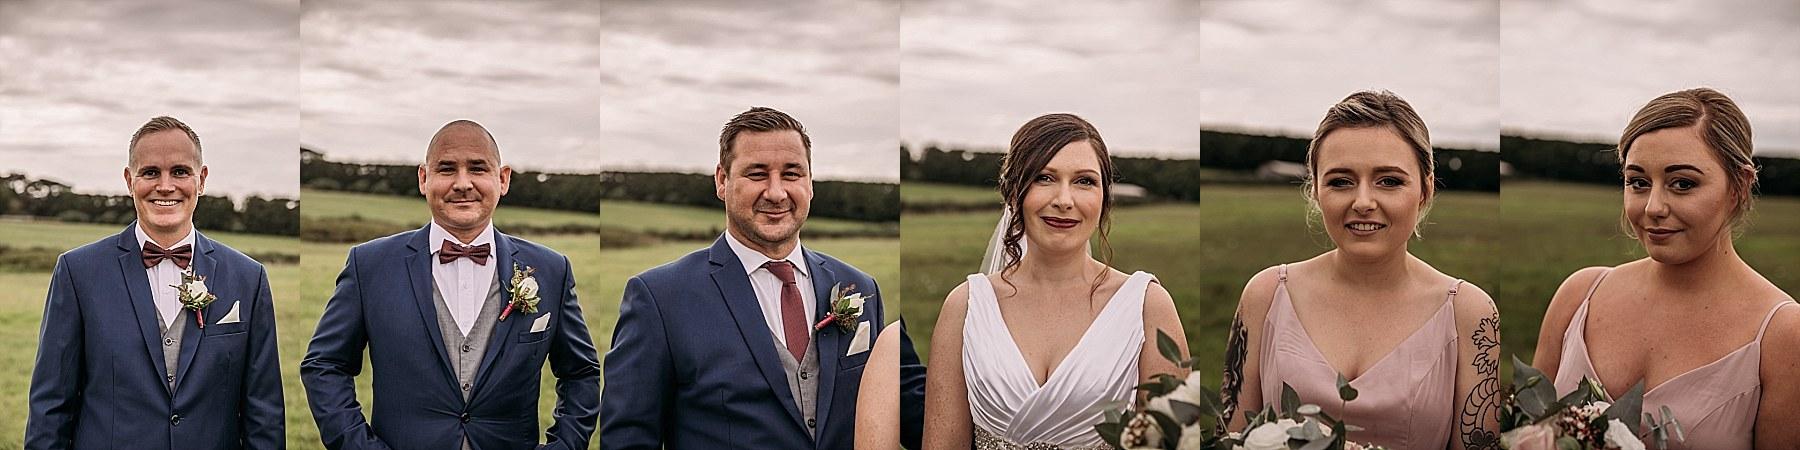 Allely Estate Wedding Auckland Wedding Photographer - Jana & Laurie_0166.jpg